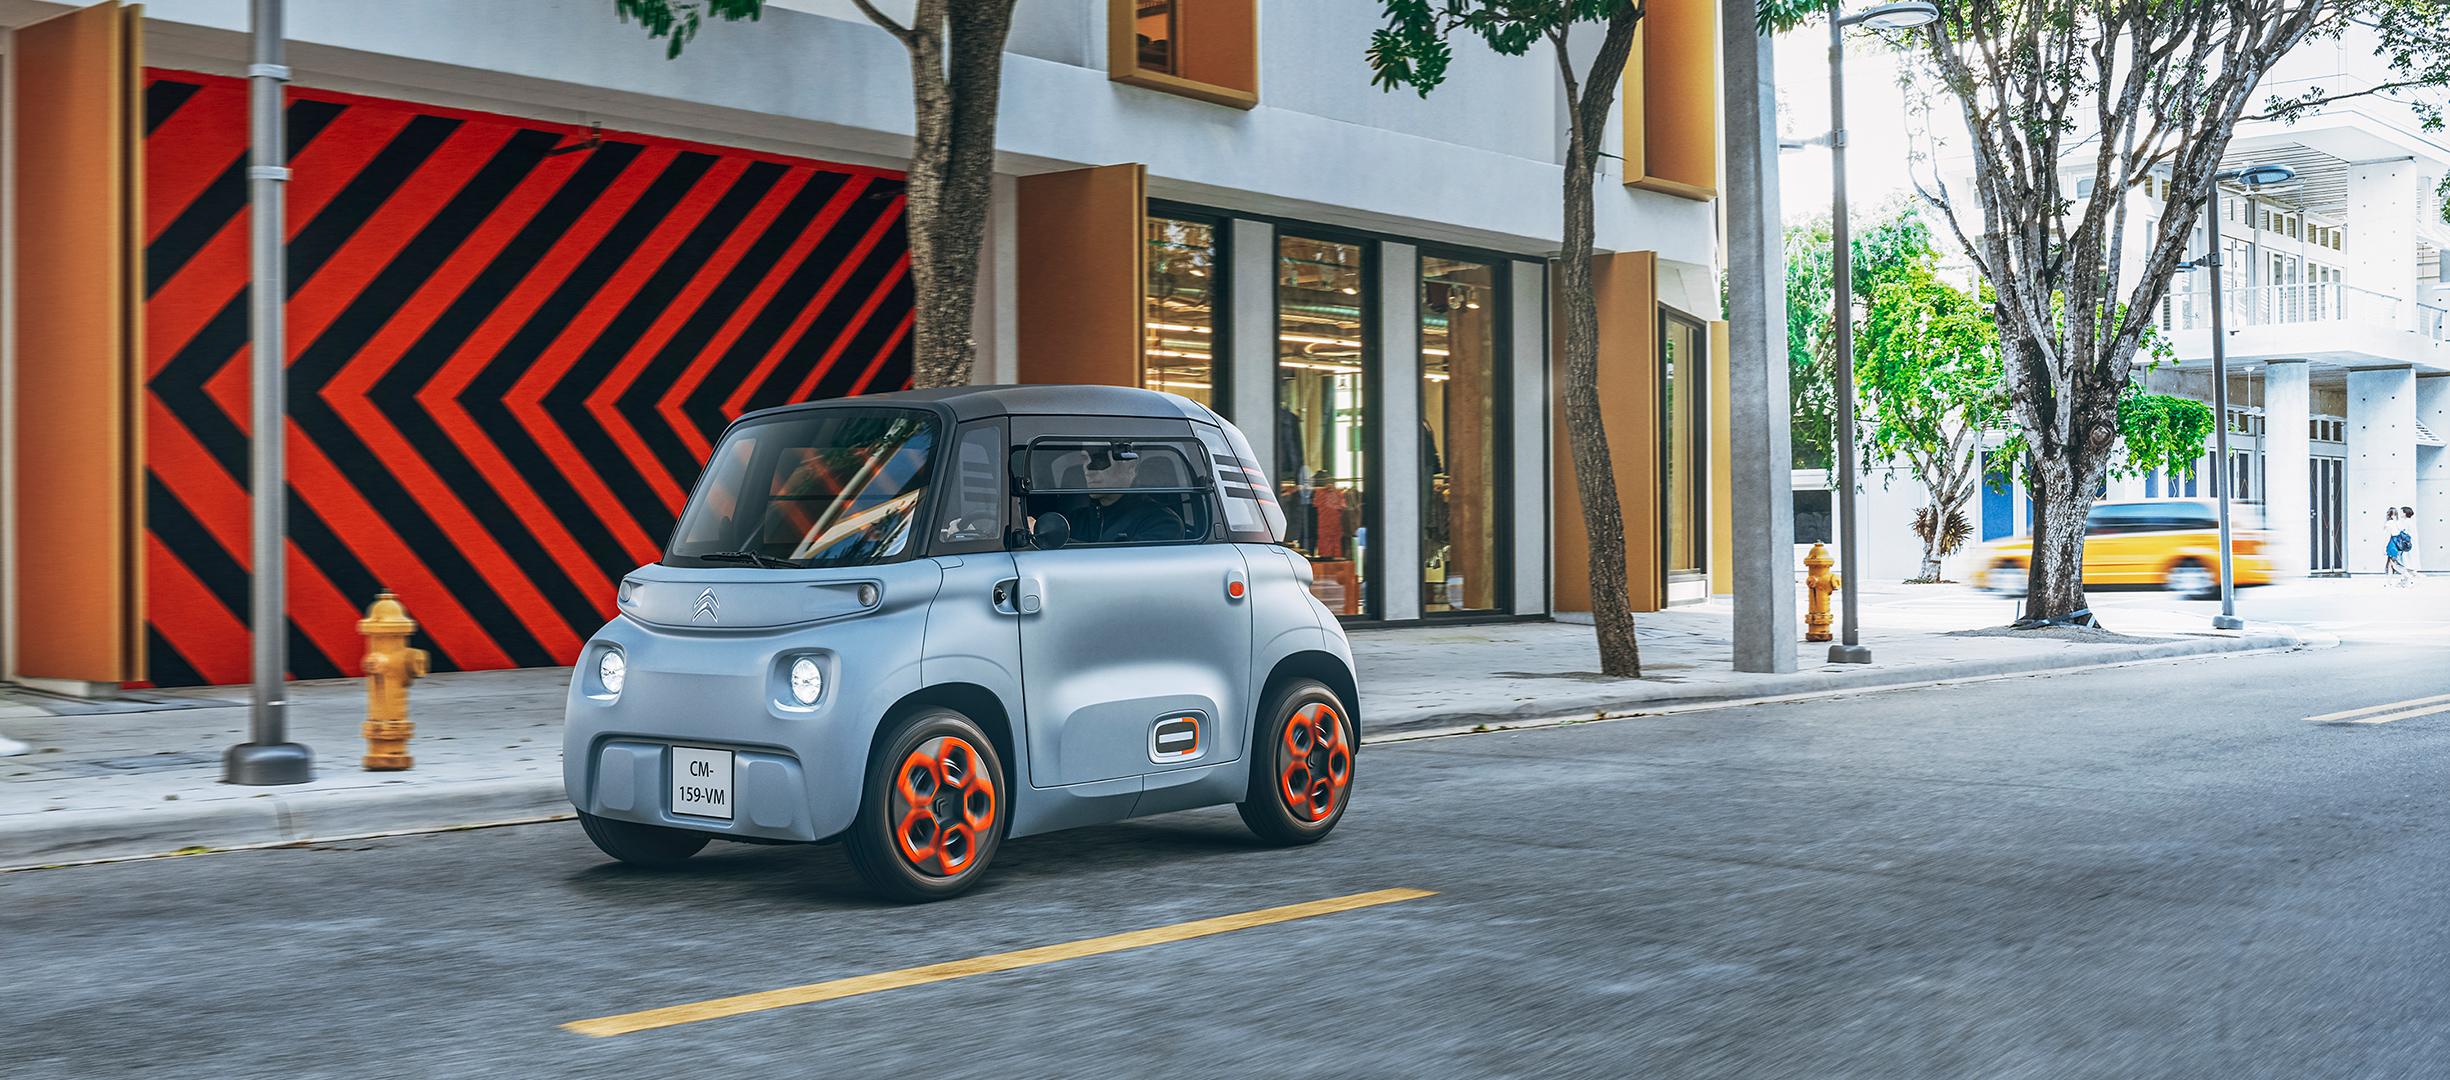 Citroën AMI, ha nacido una estrella